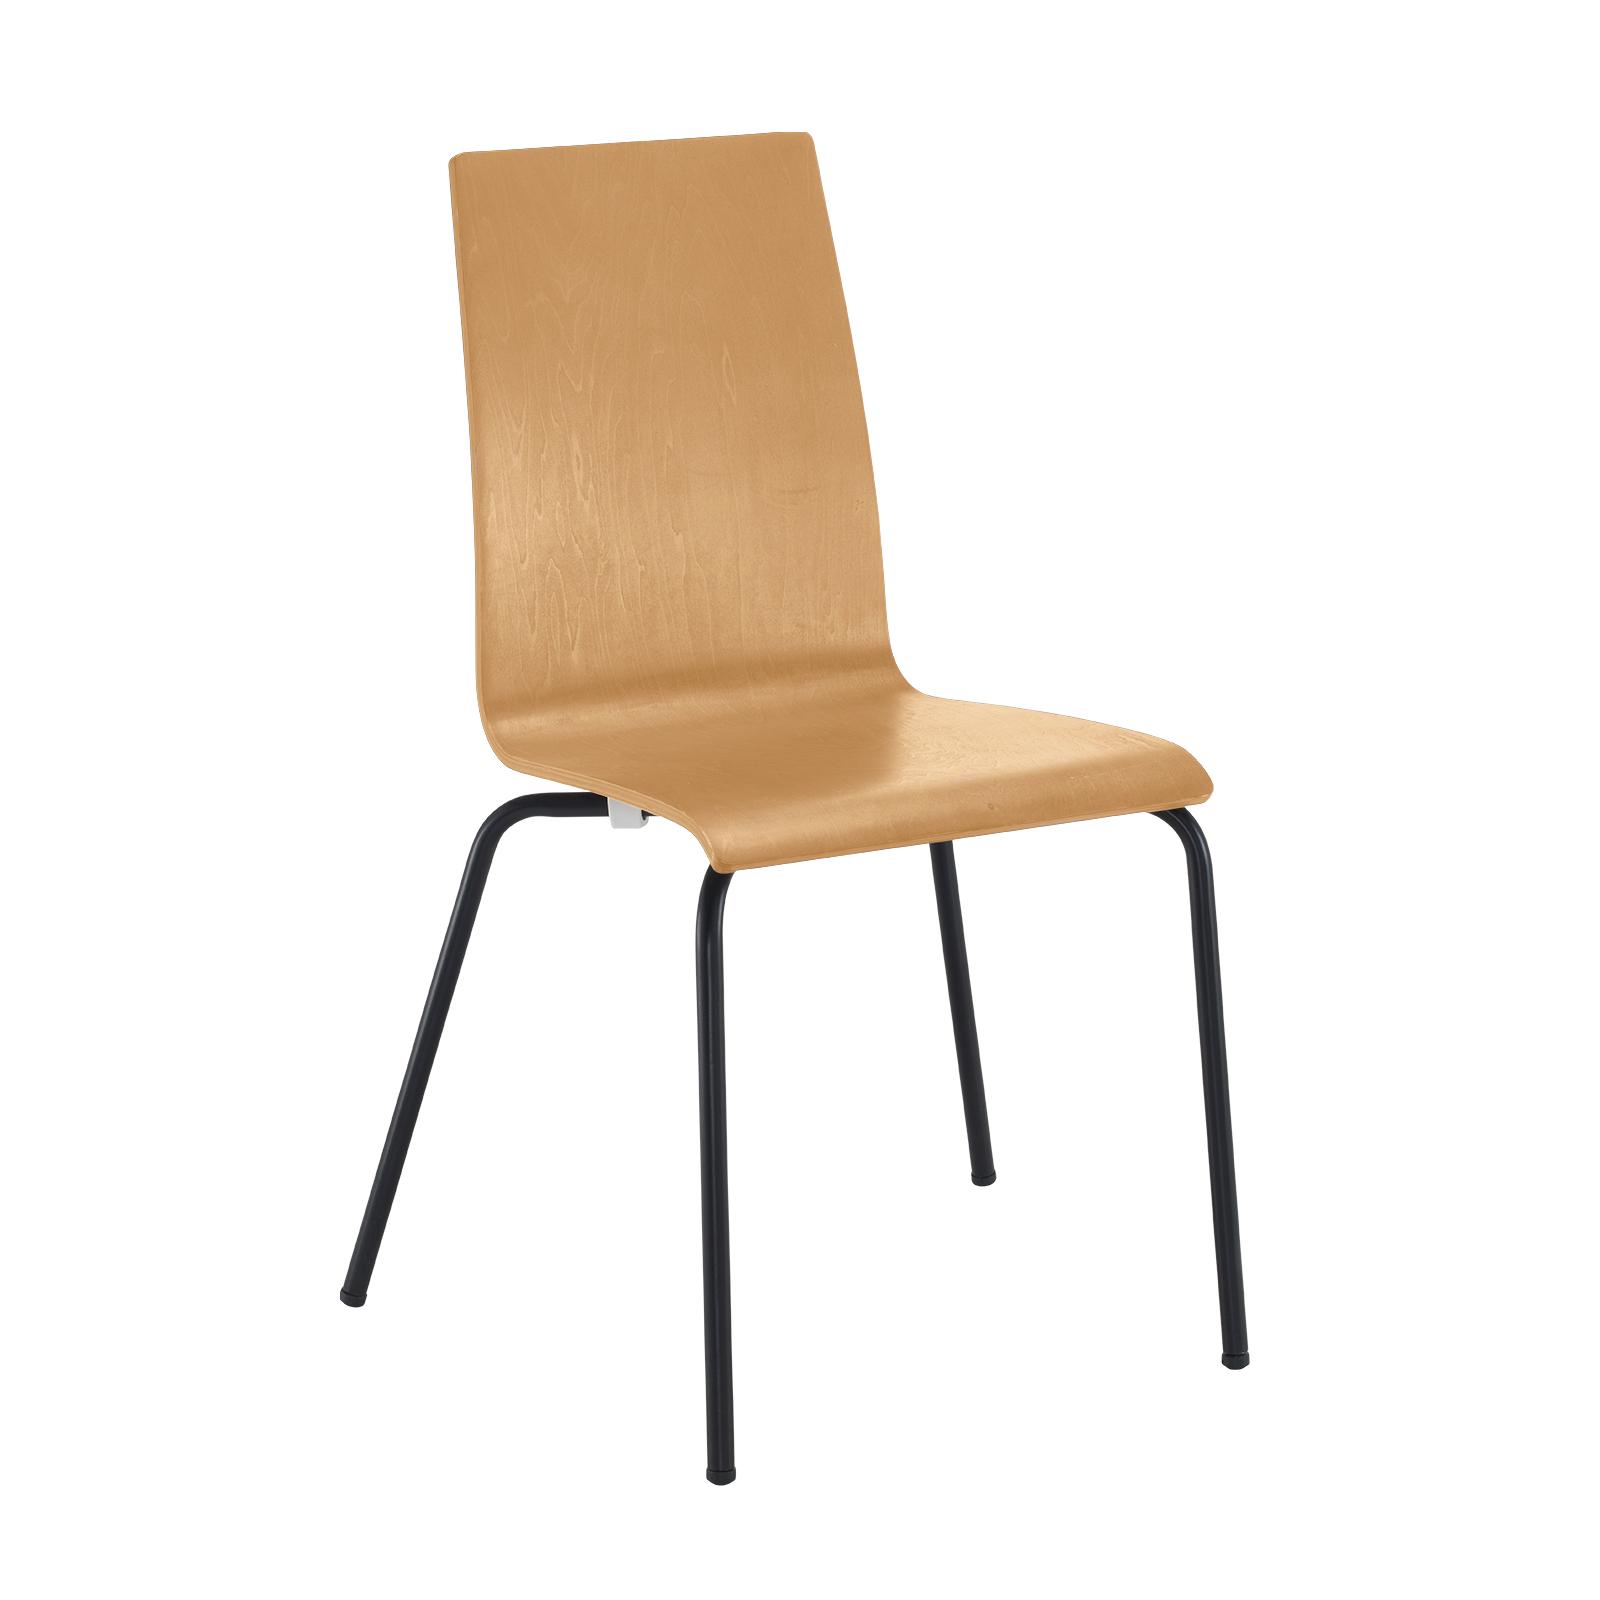 Fundamental dining chair